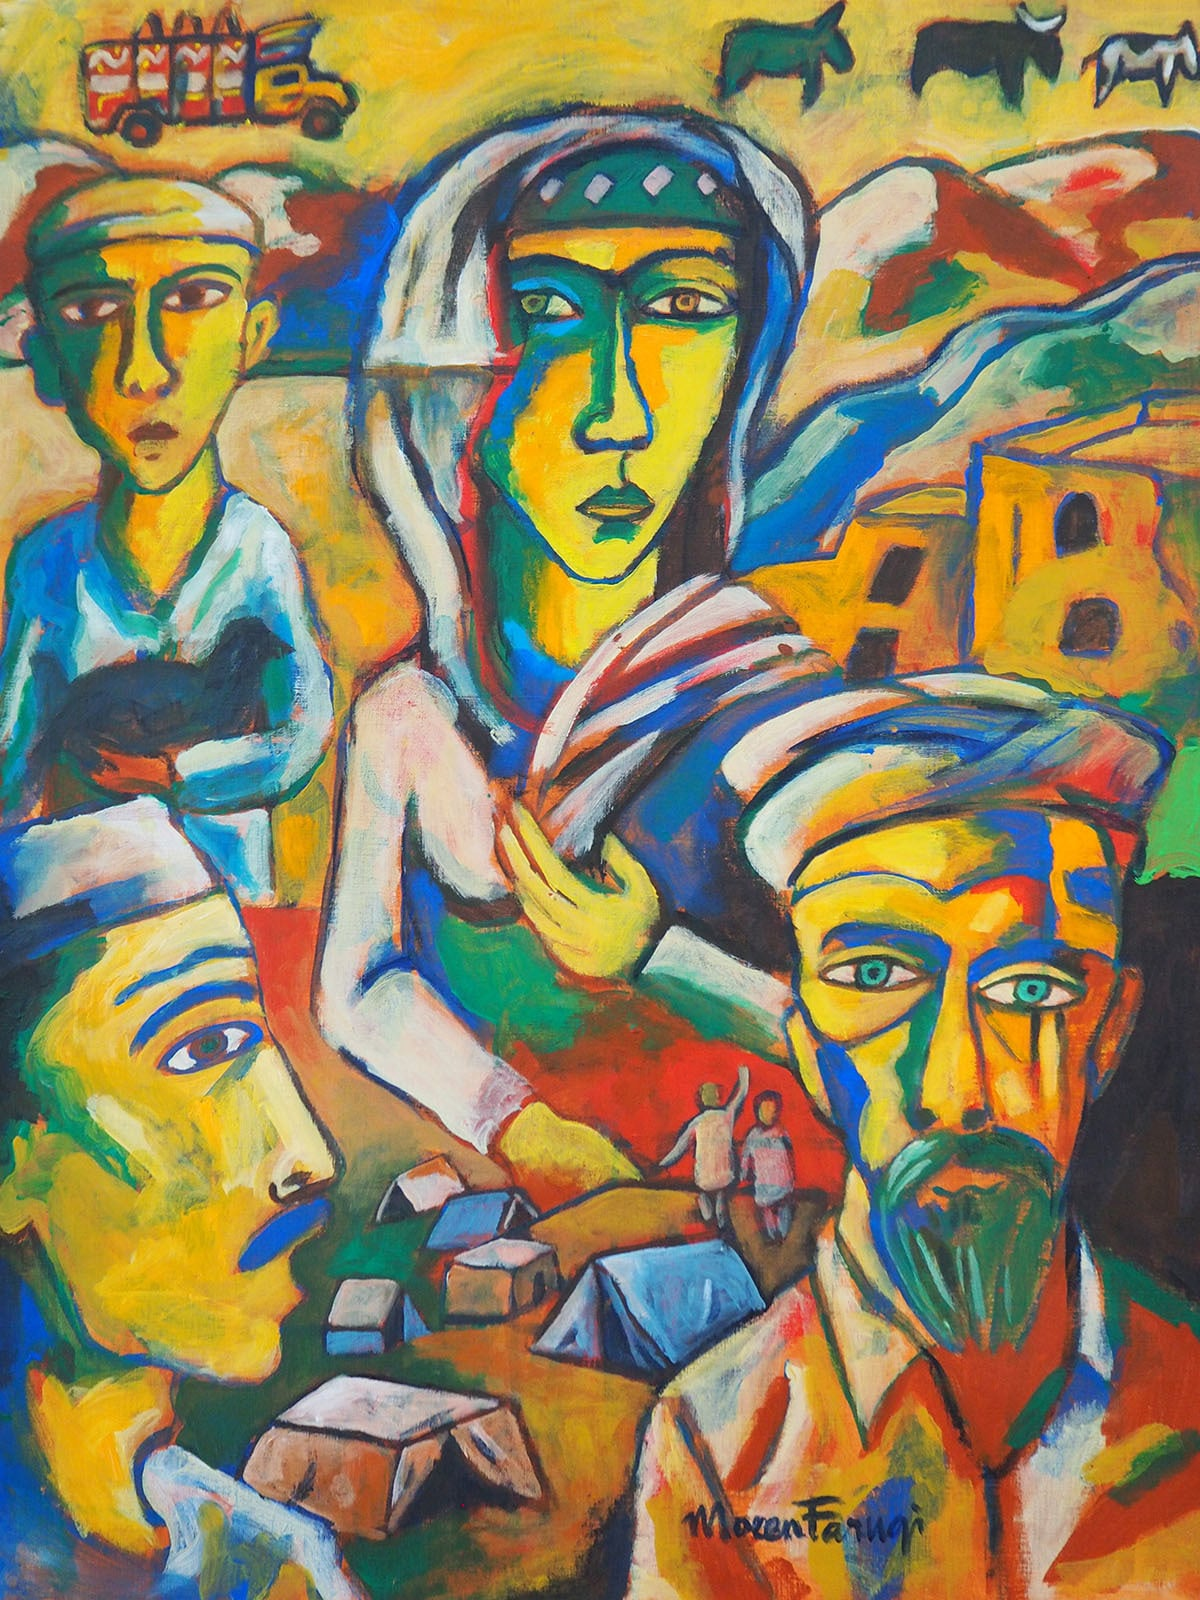 The Lost Generation | Moeen Faruqi (acrylic on canvas)